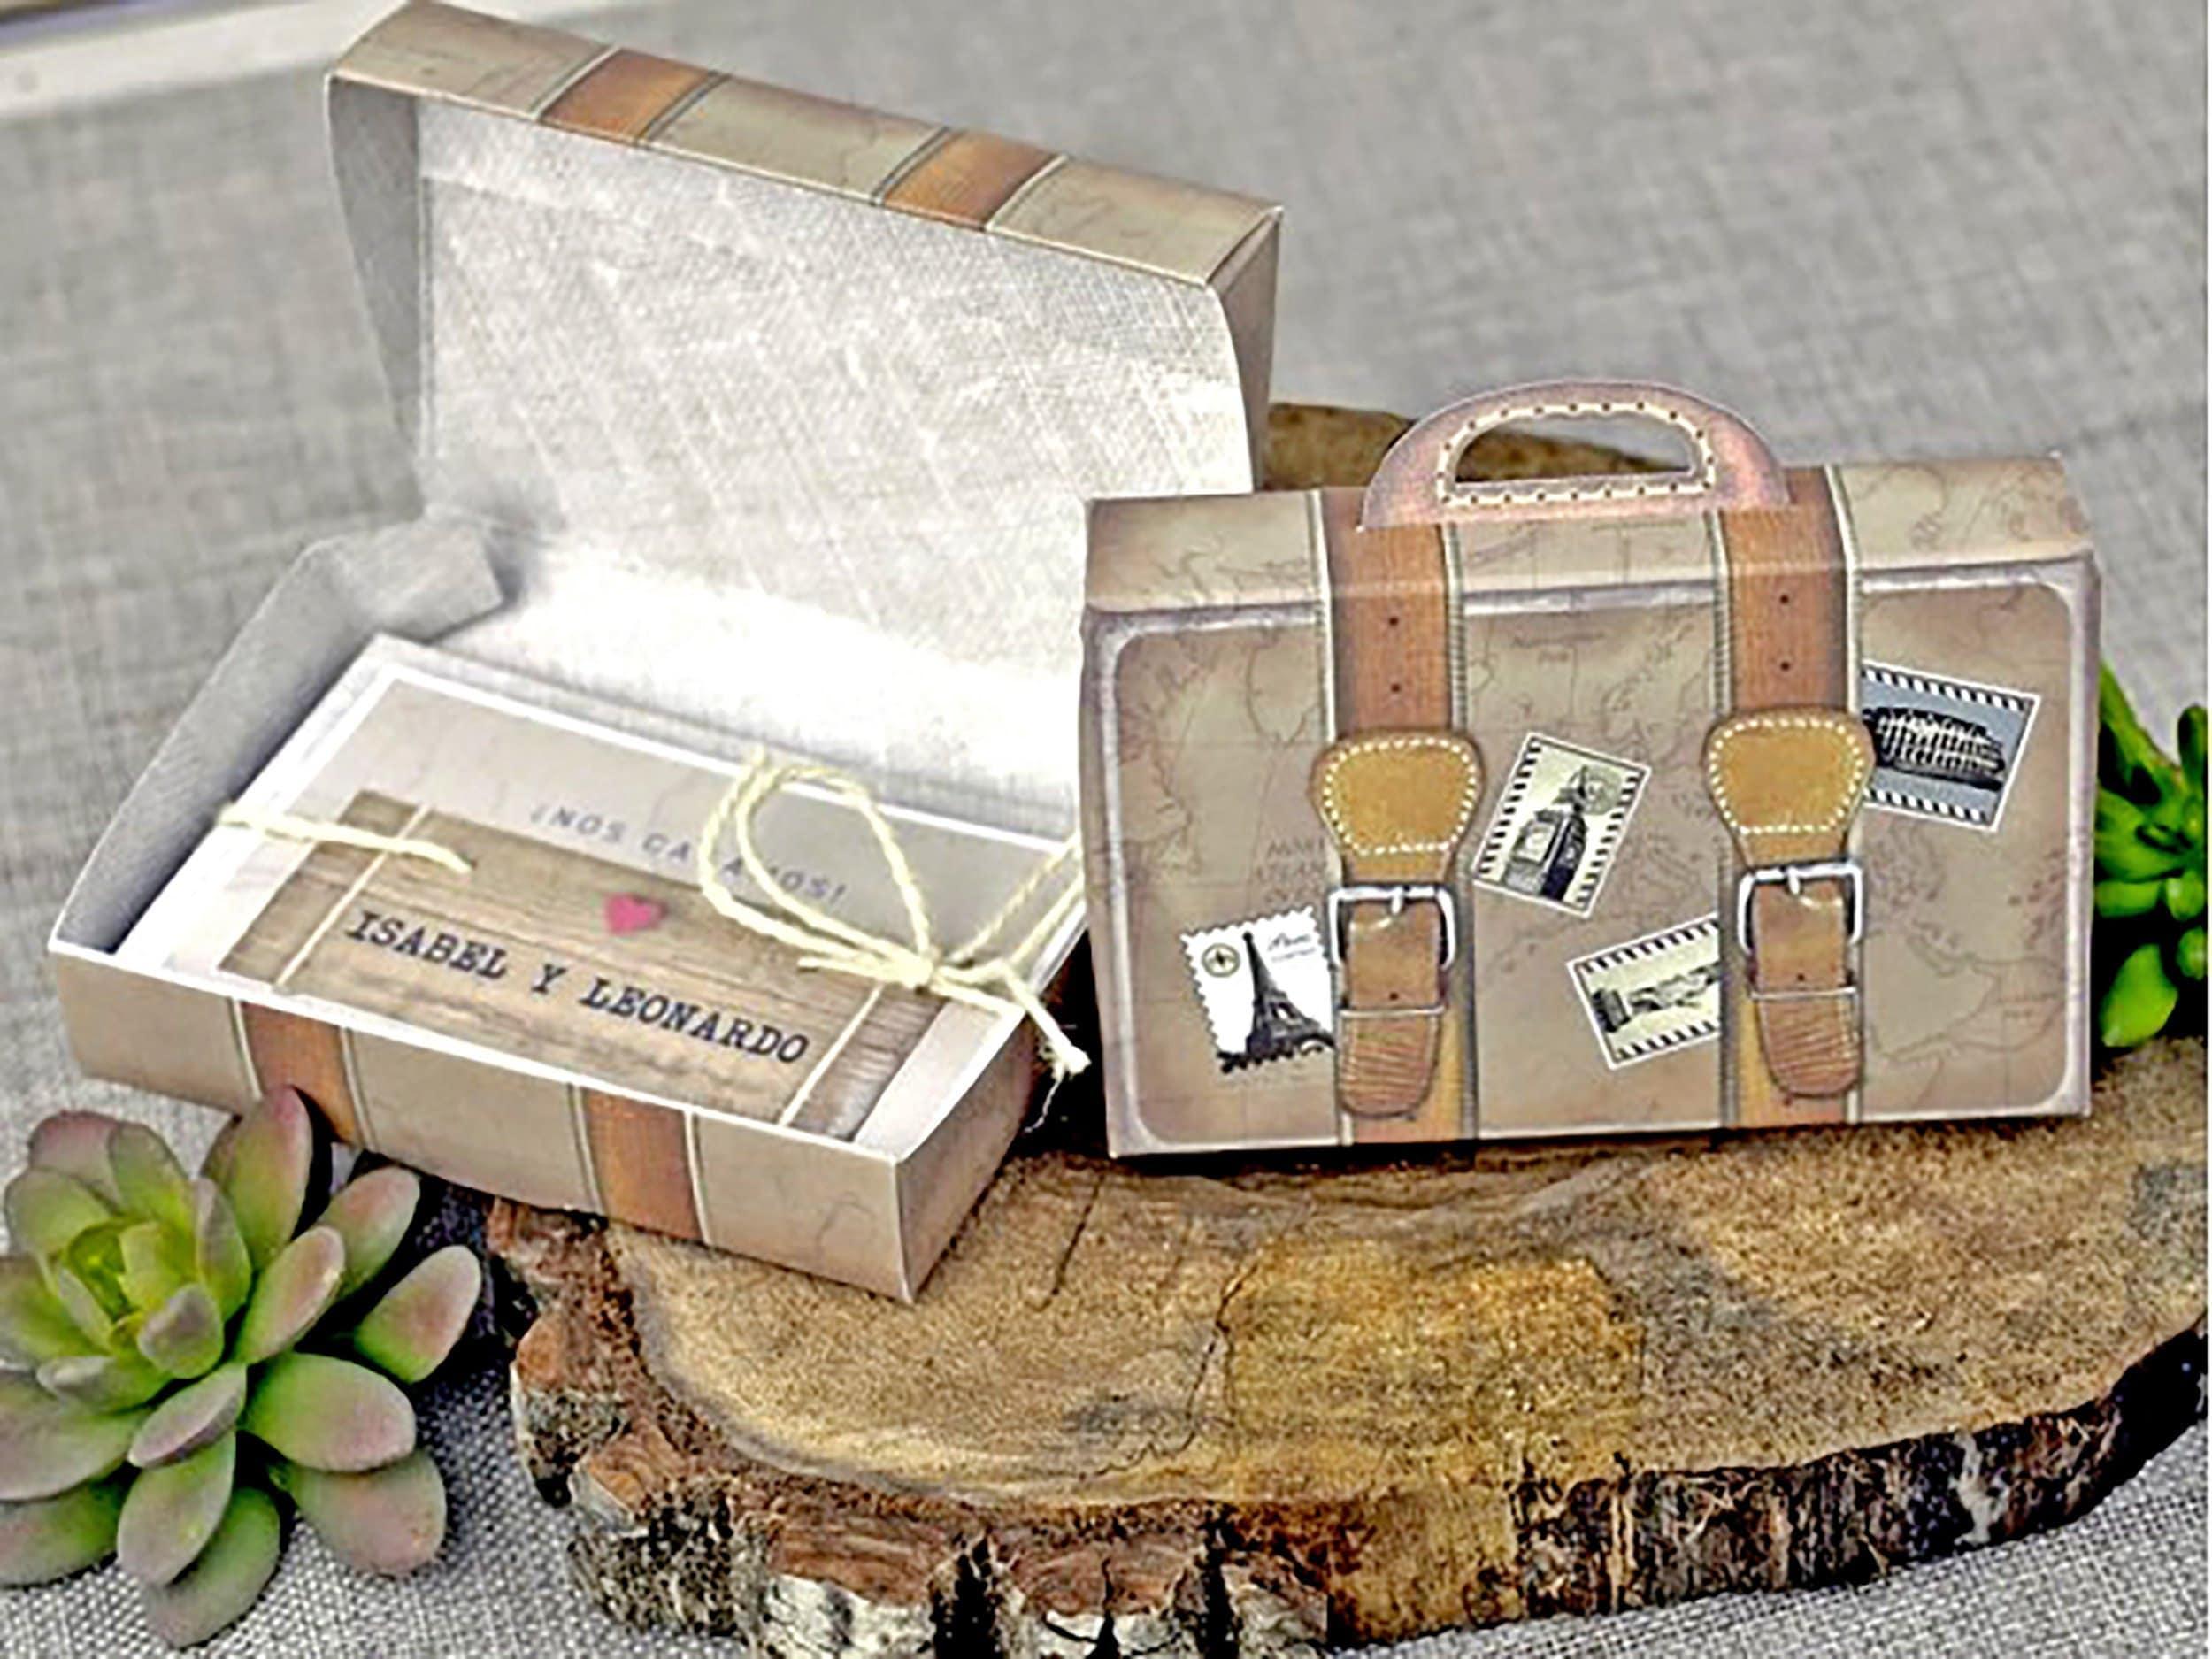 Up Themed Wedding Invitations: Megan Luggage Wedding Invitation Travel Theme Wedding Pop